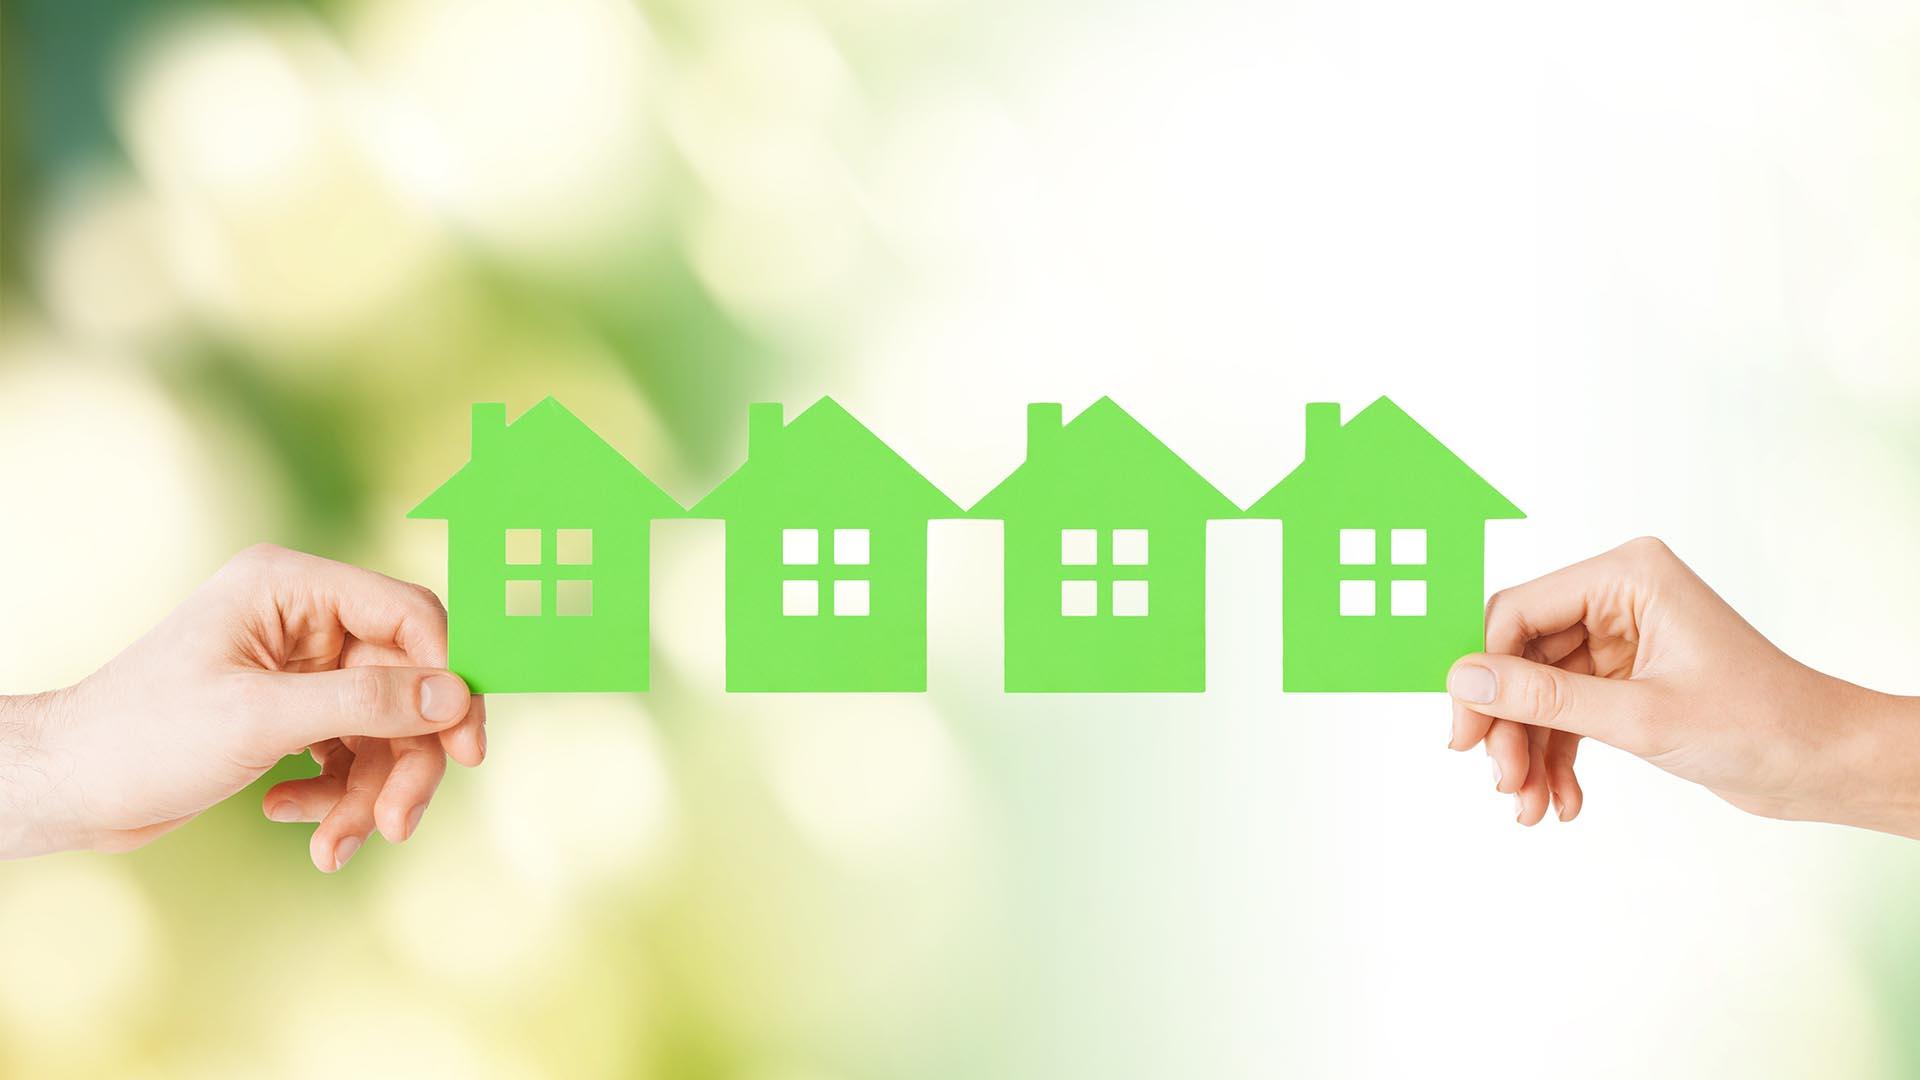 Under PMAY Gramin, Uttar Pradesh Sets District-wise Housing Targets